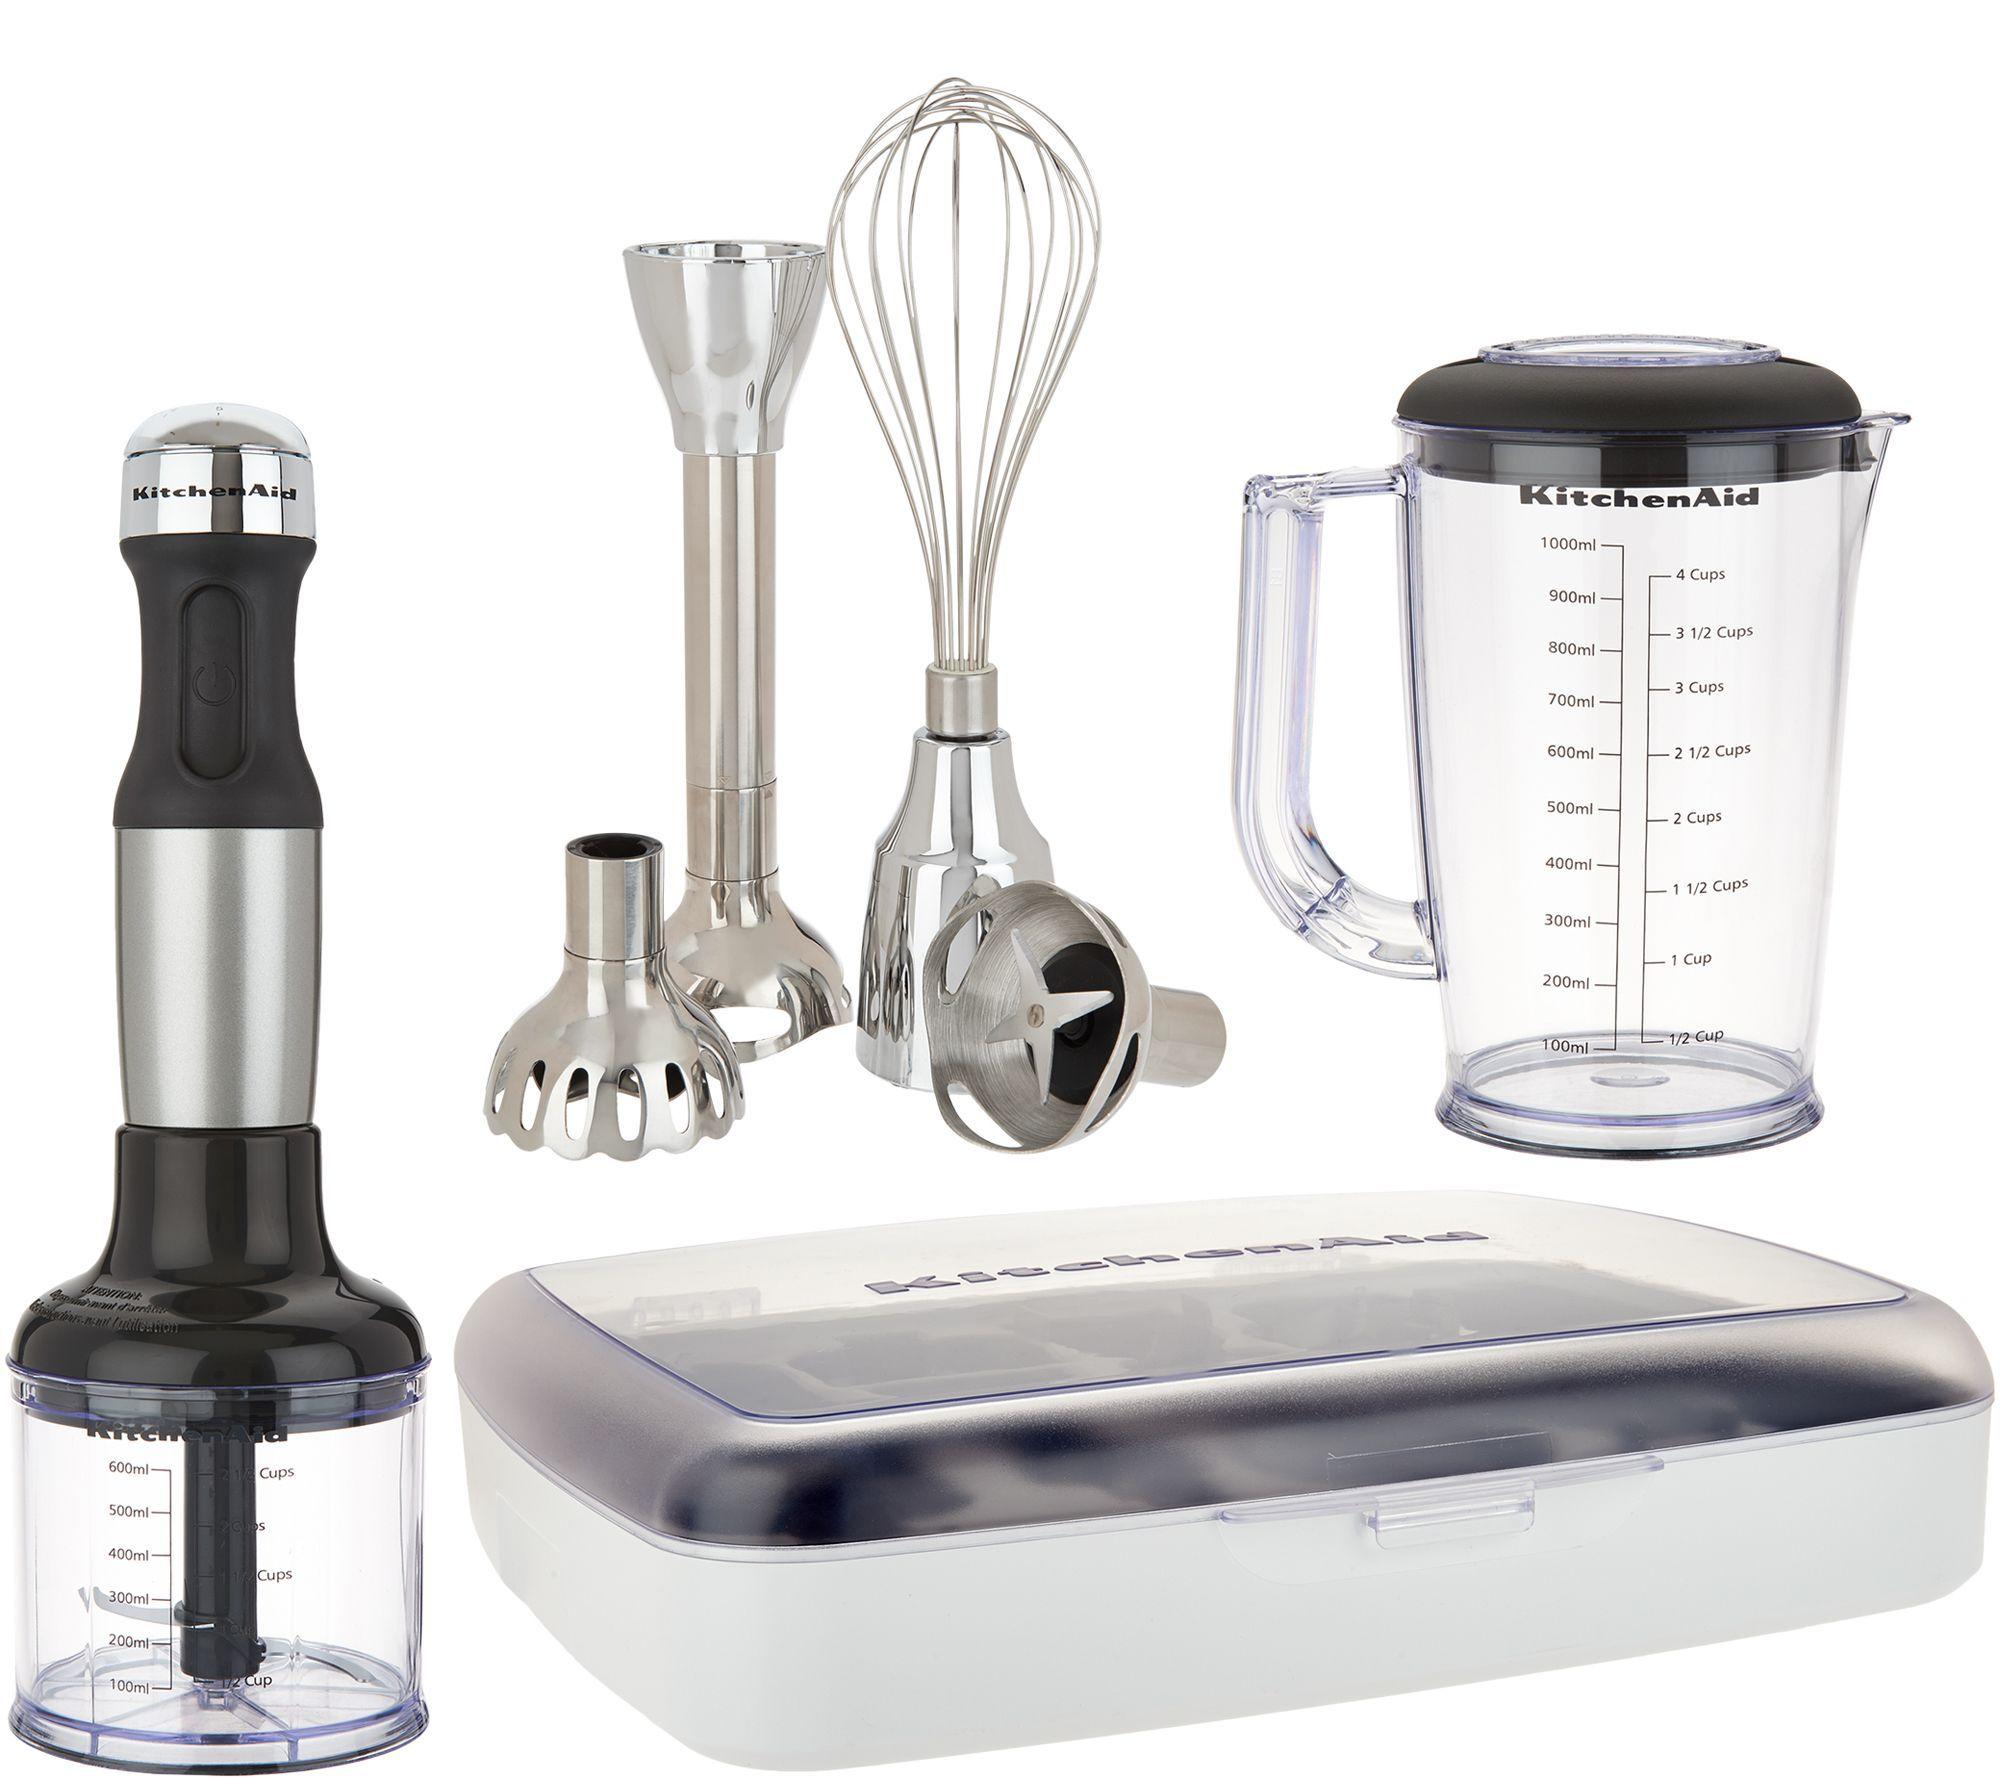 Kitchenaid 5 speed immersion blender w case and